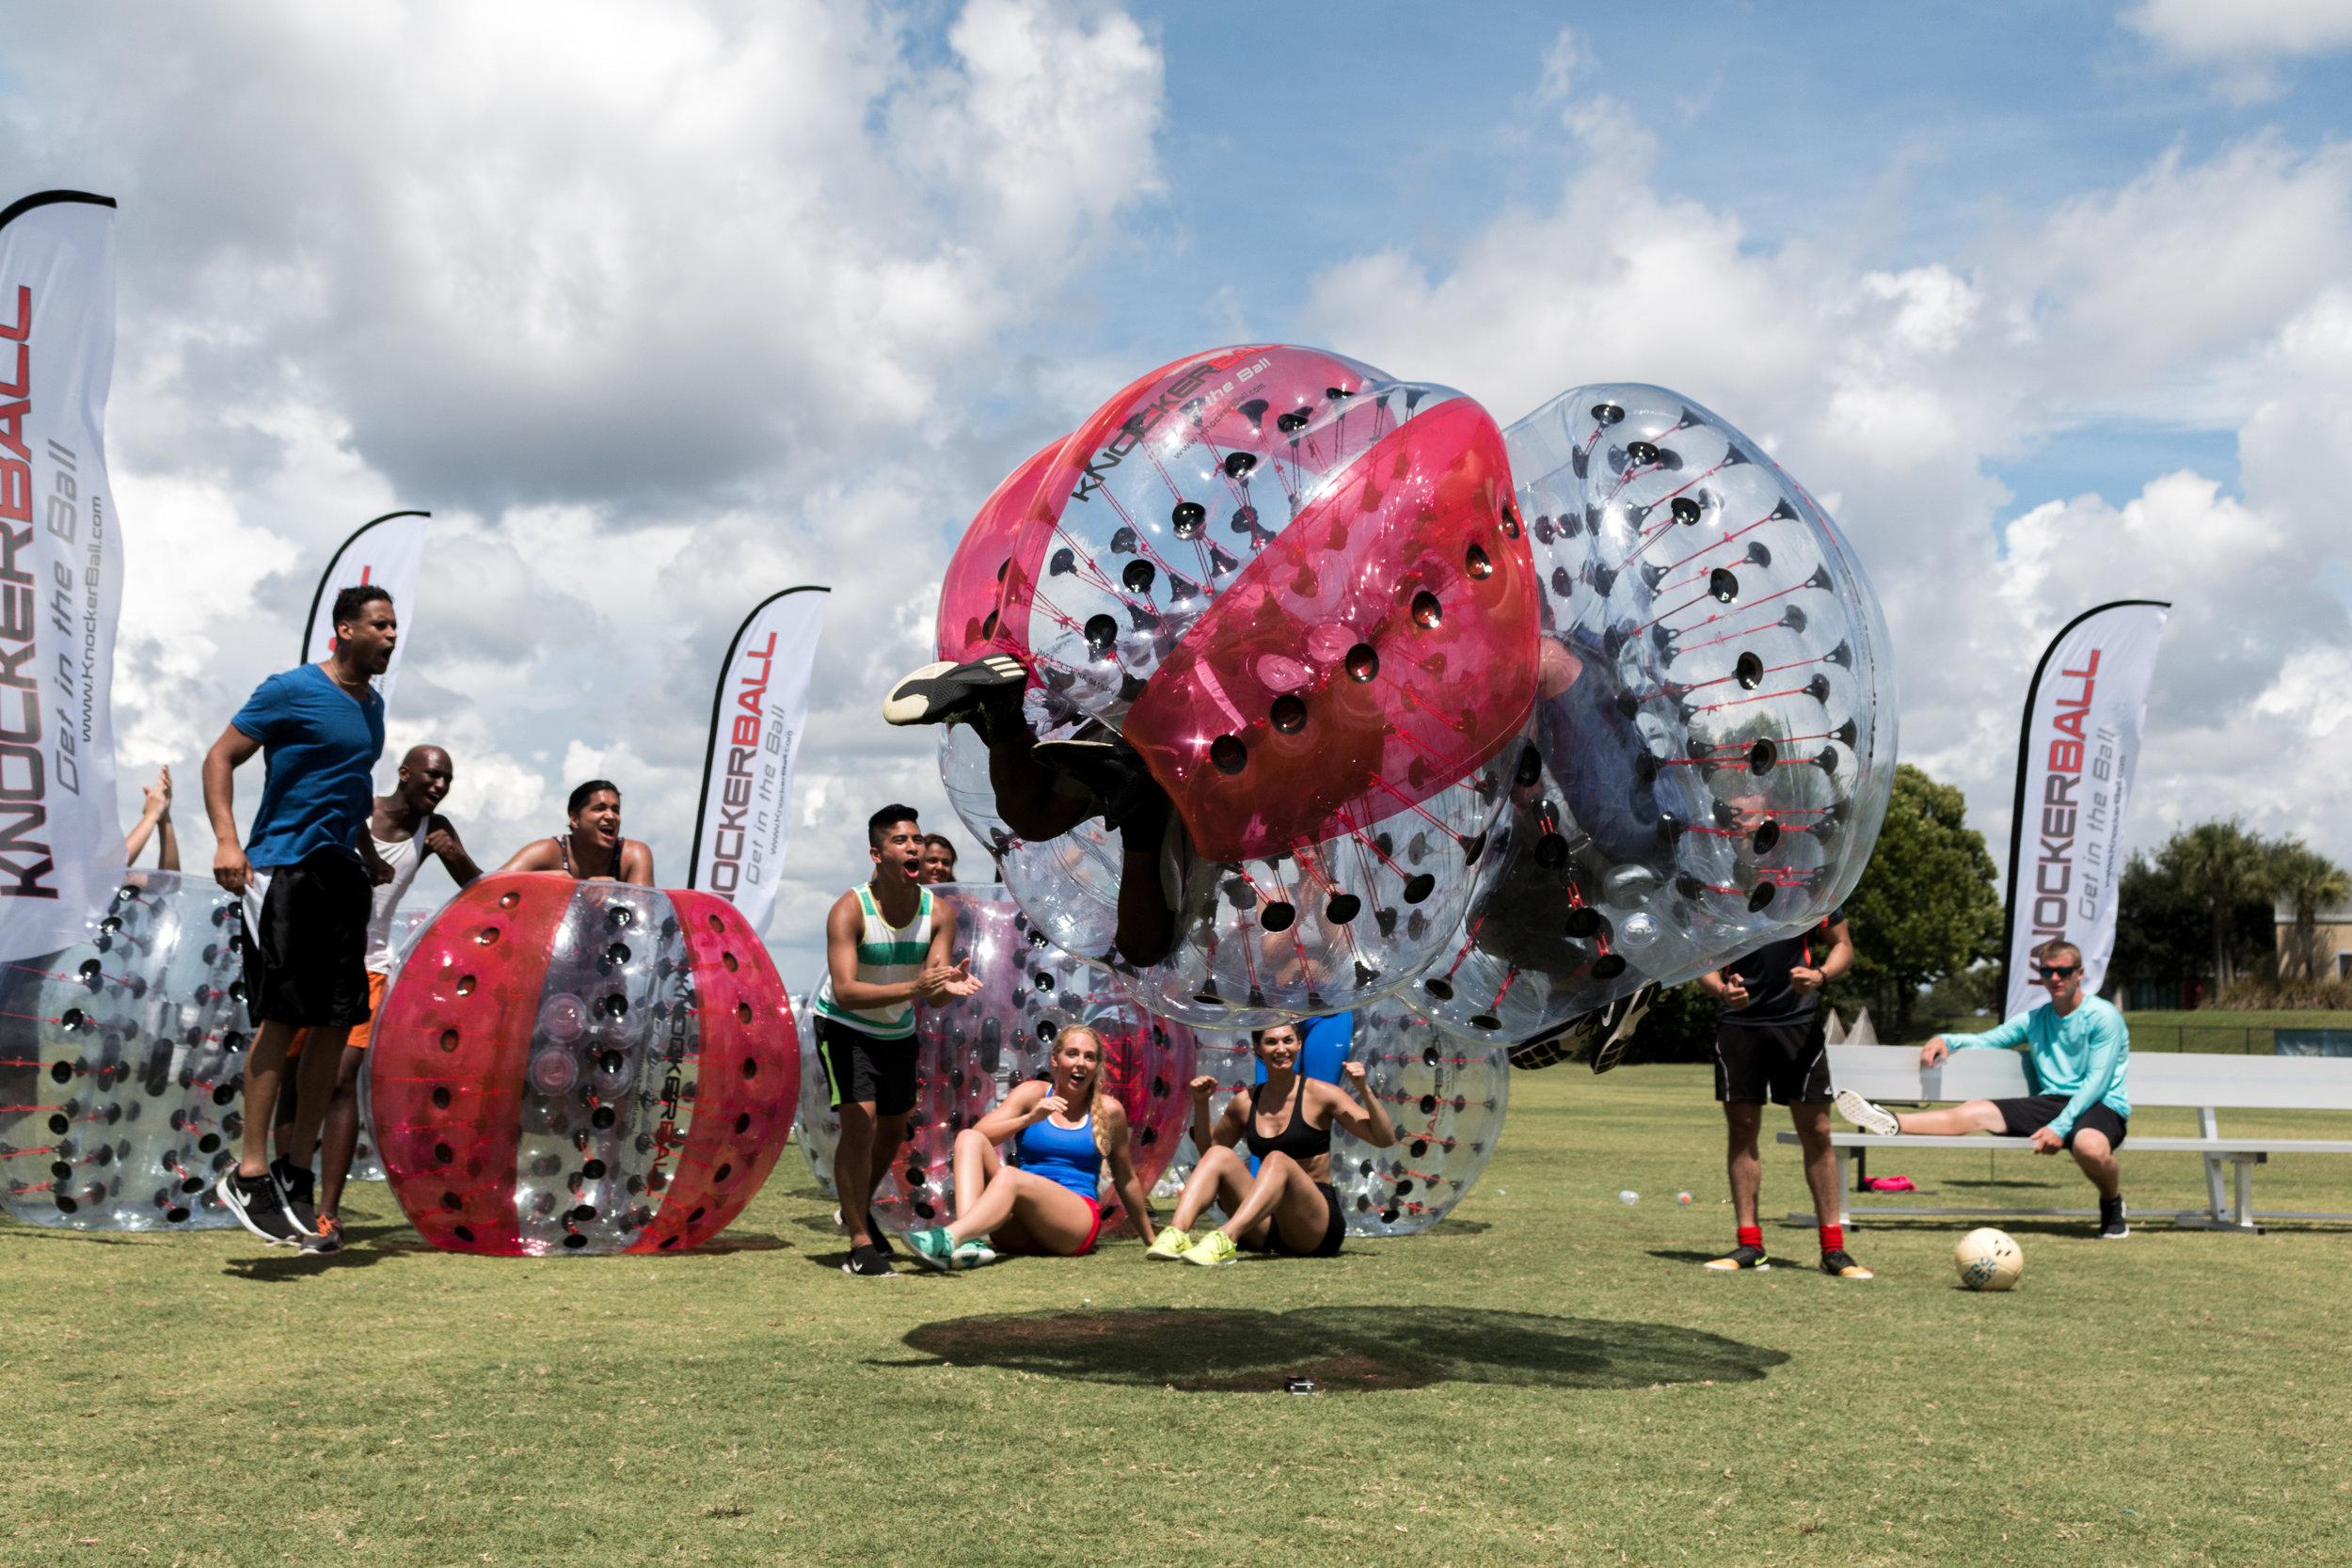 DFW Knockerball Bubble Soccer